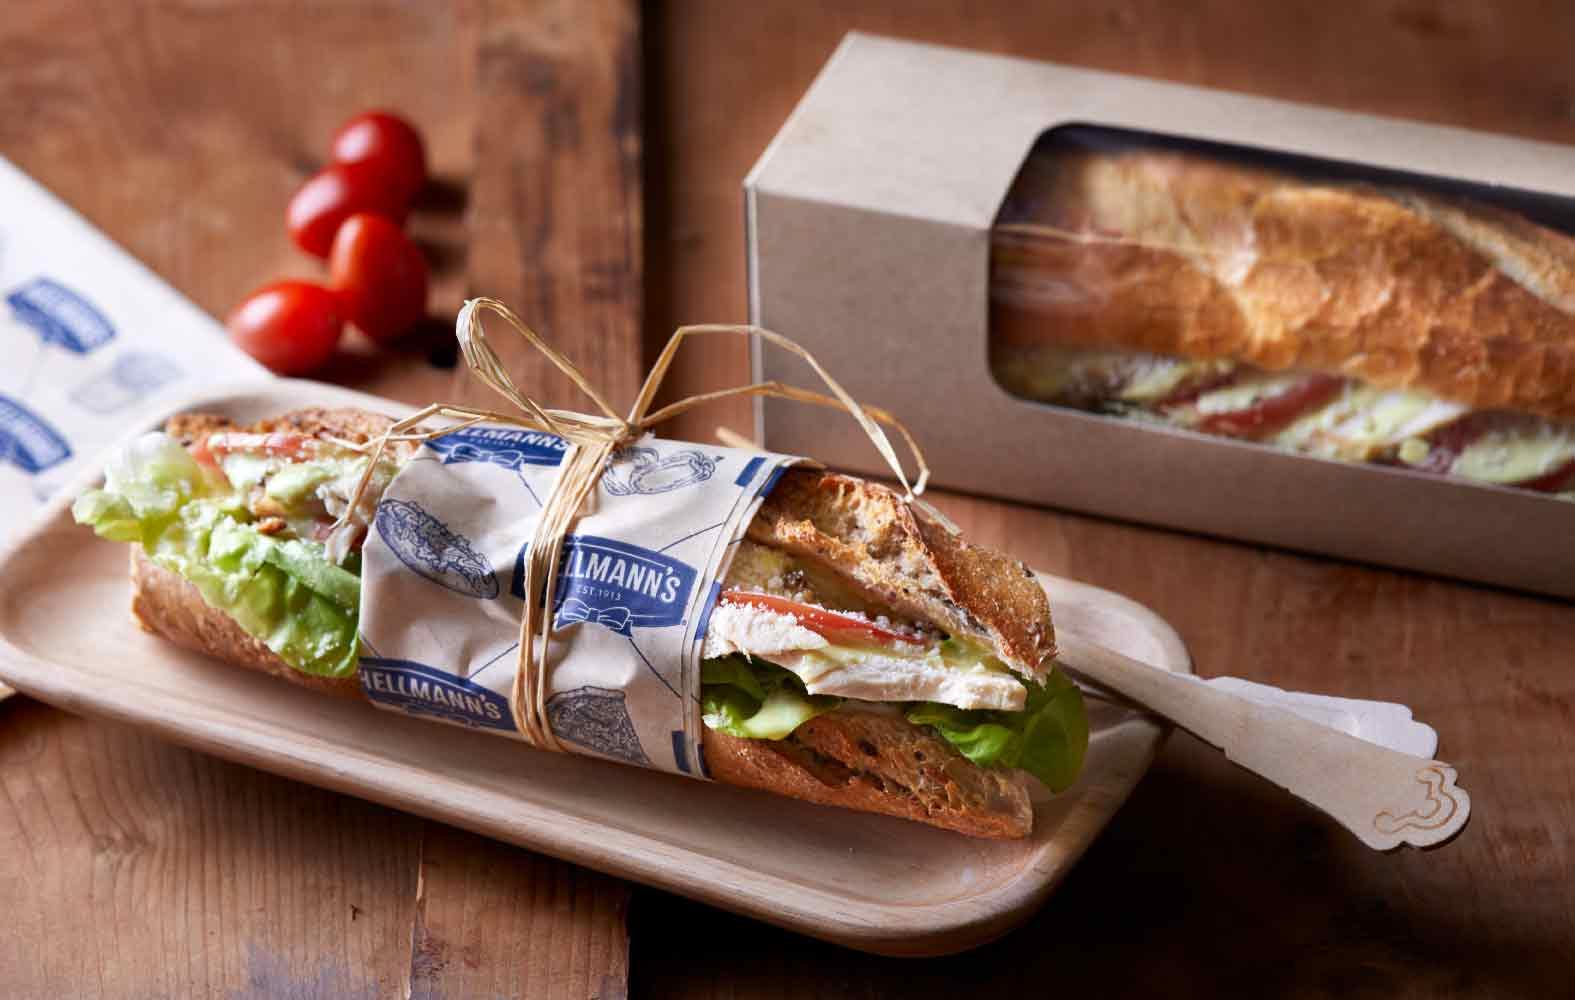 Paper sandwich box with window